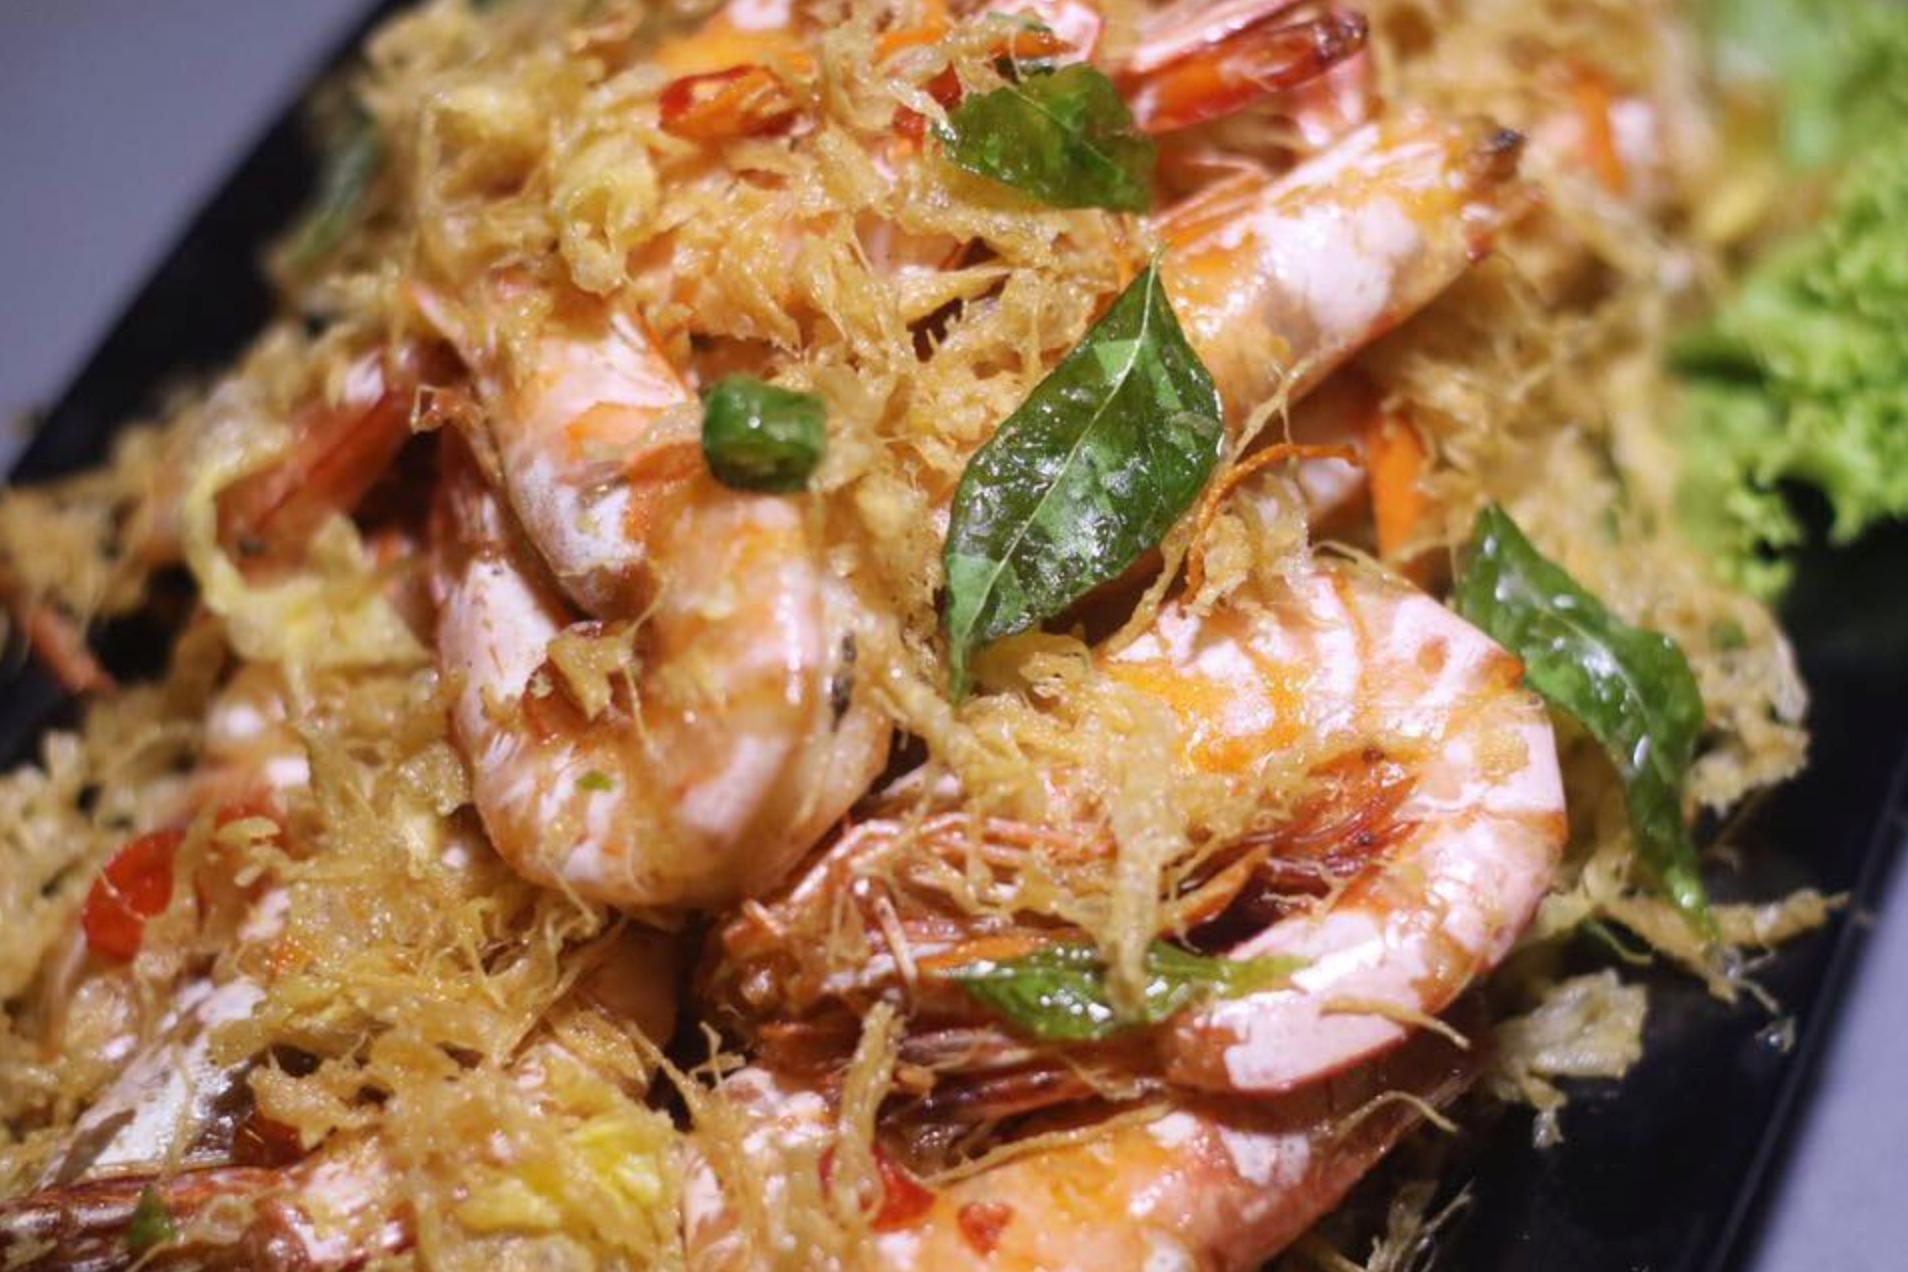 jalan jalan cari makan  picks Resepi Sambal Nasi Lemak Sabah Enak dan Mudah